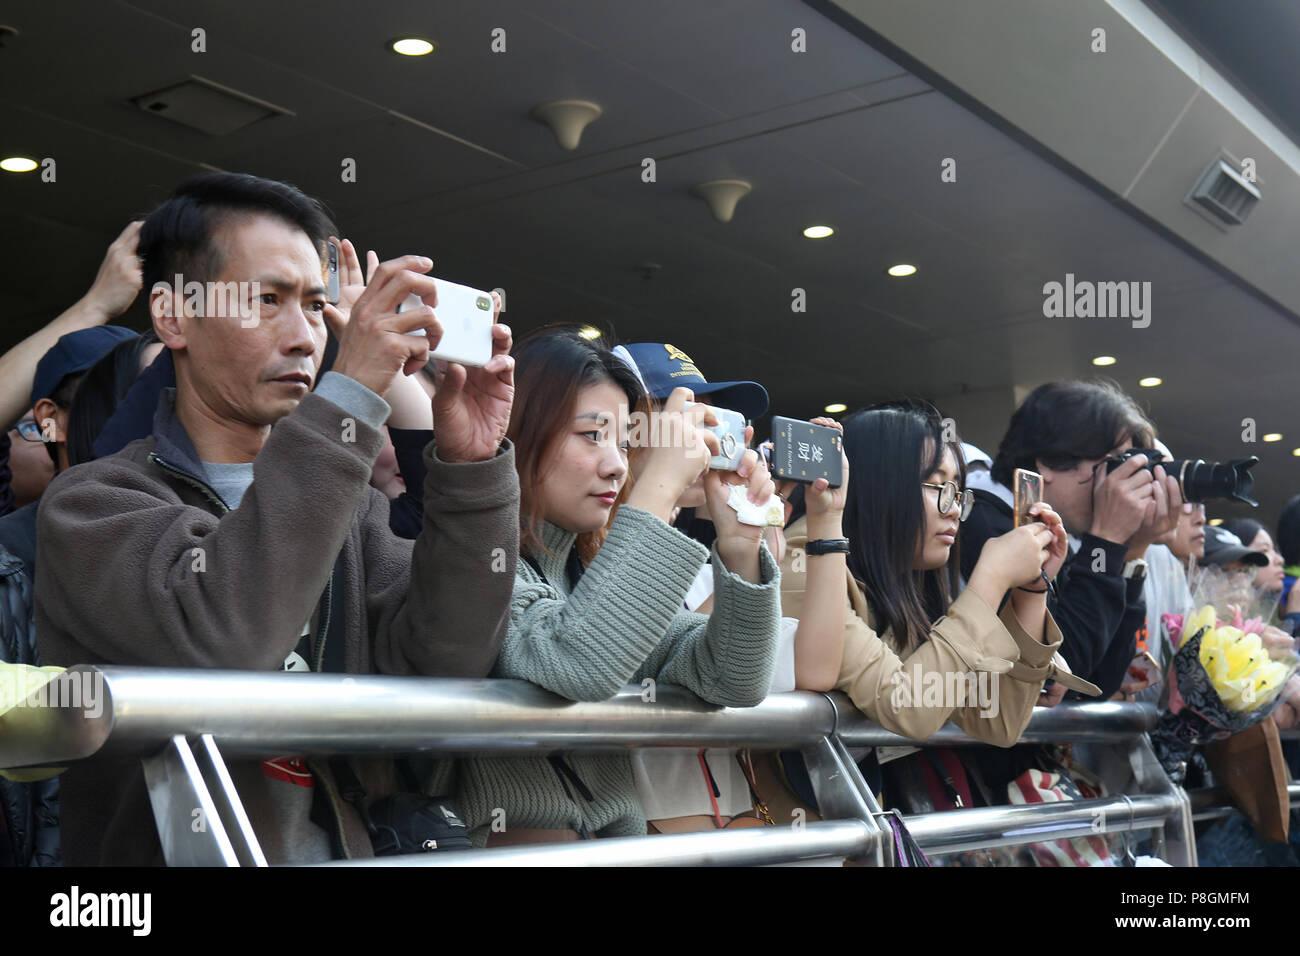 Hong Kong, China, Asians photograph with their smartphones - Stock Image